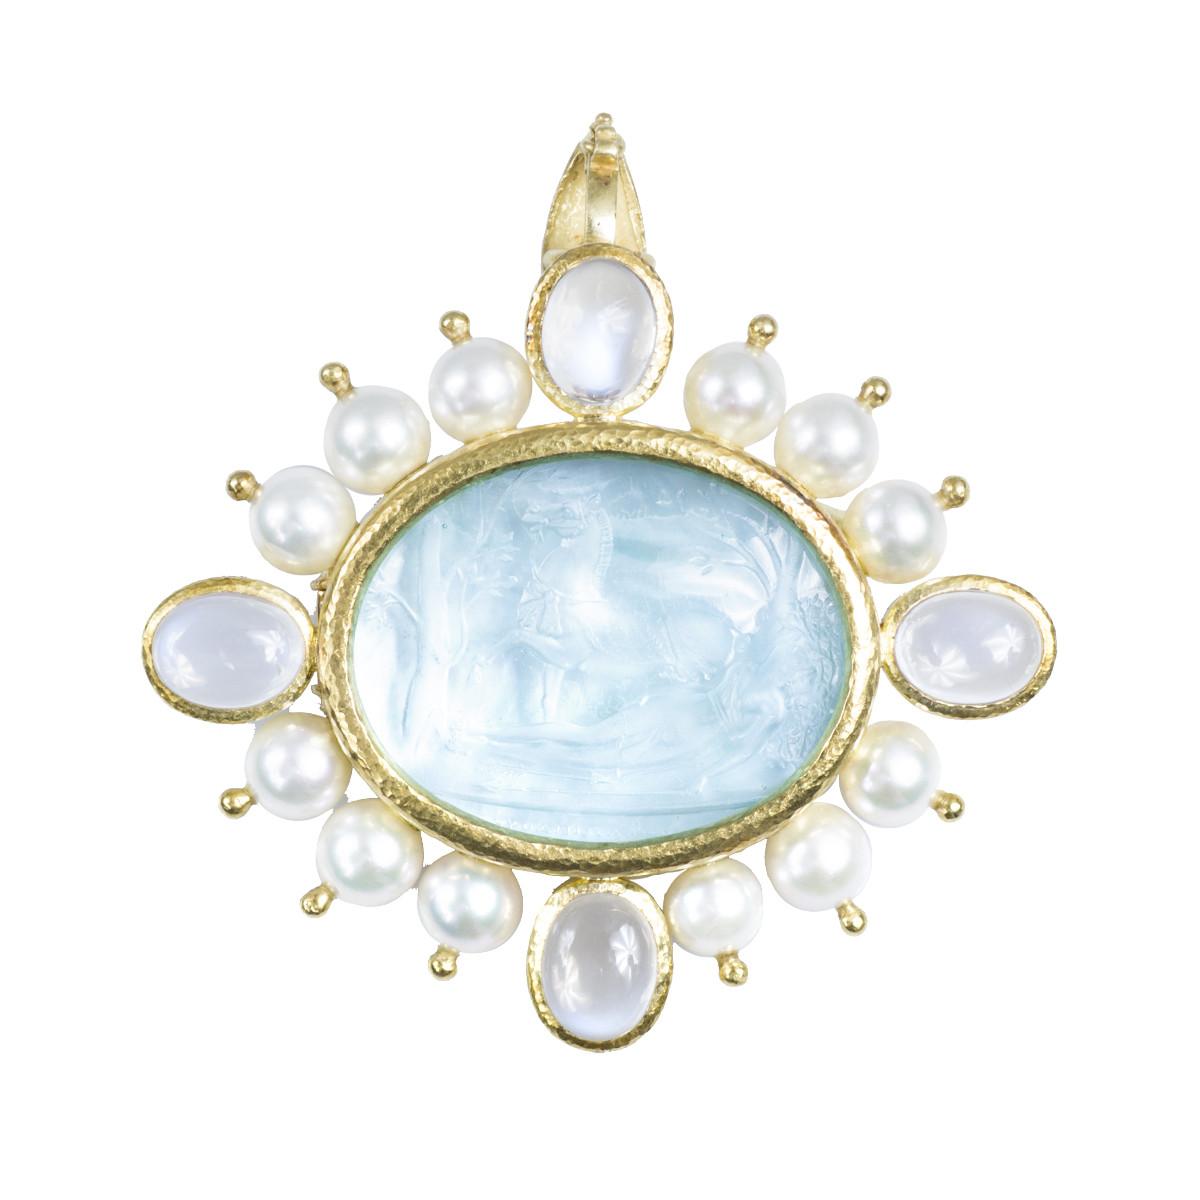 Vintage Elizabeth Locke Venetian Intaglio Glass, Moonstone & Pearl Brooch